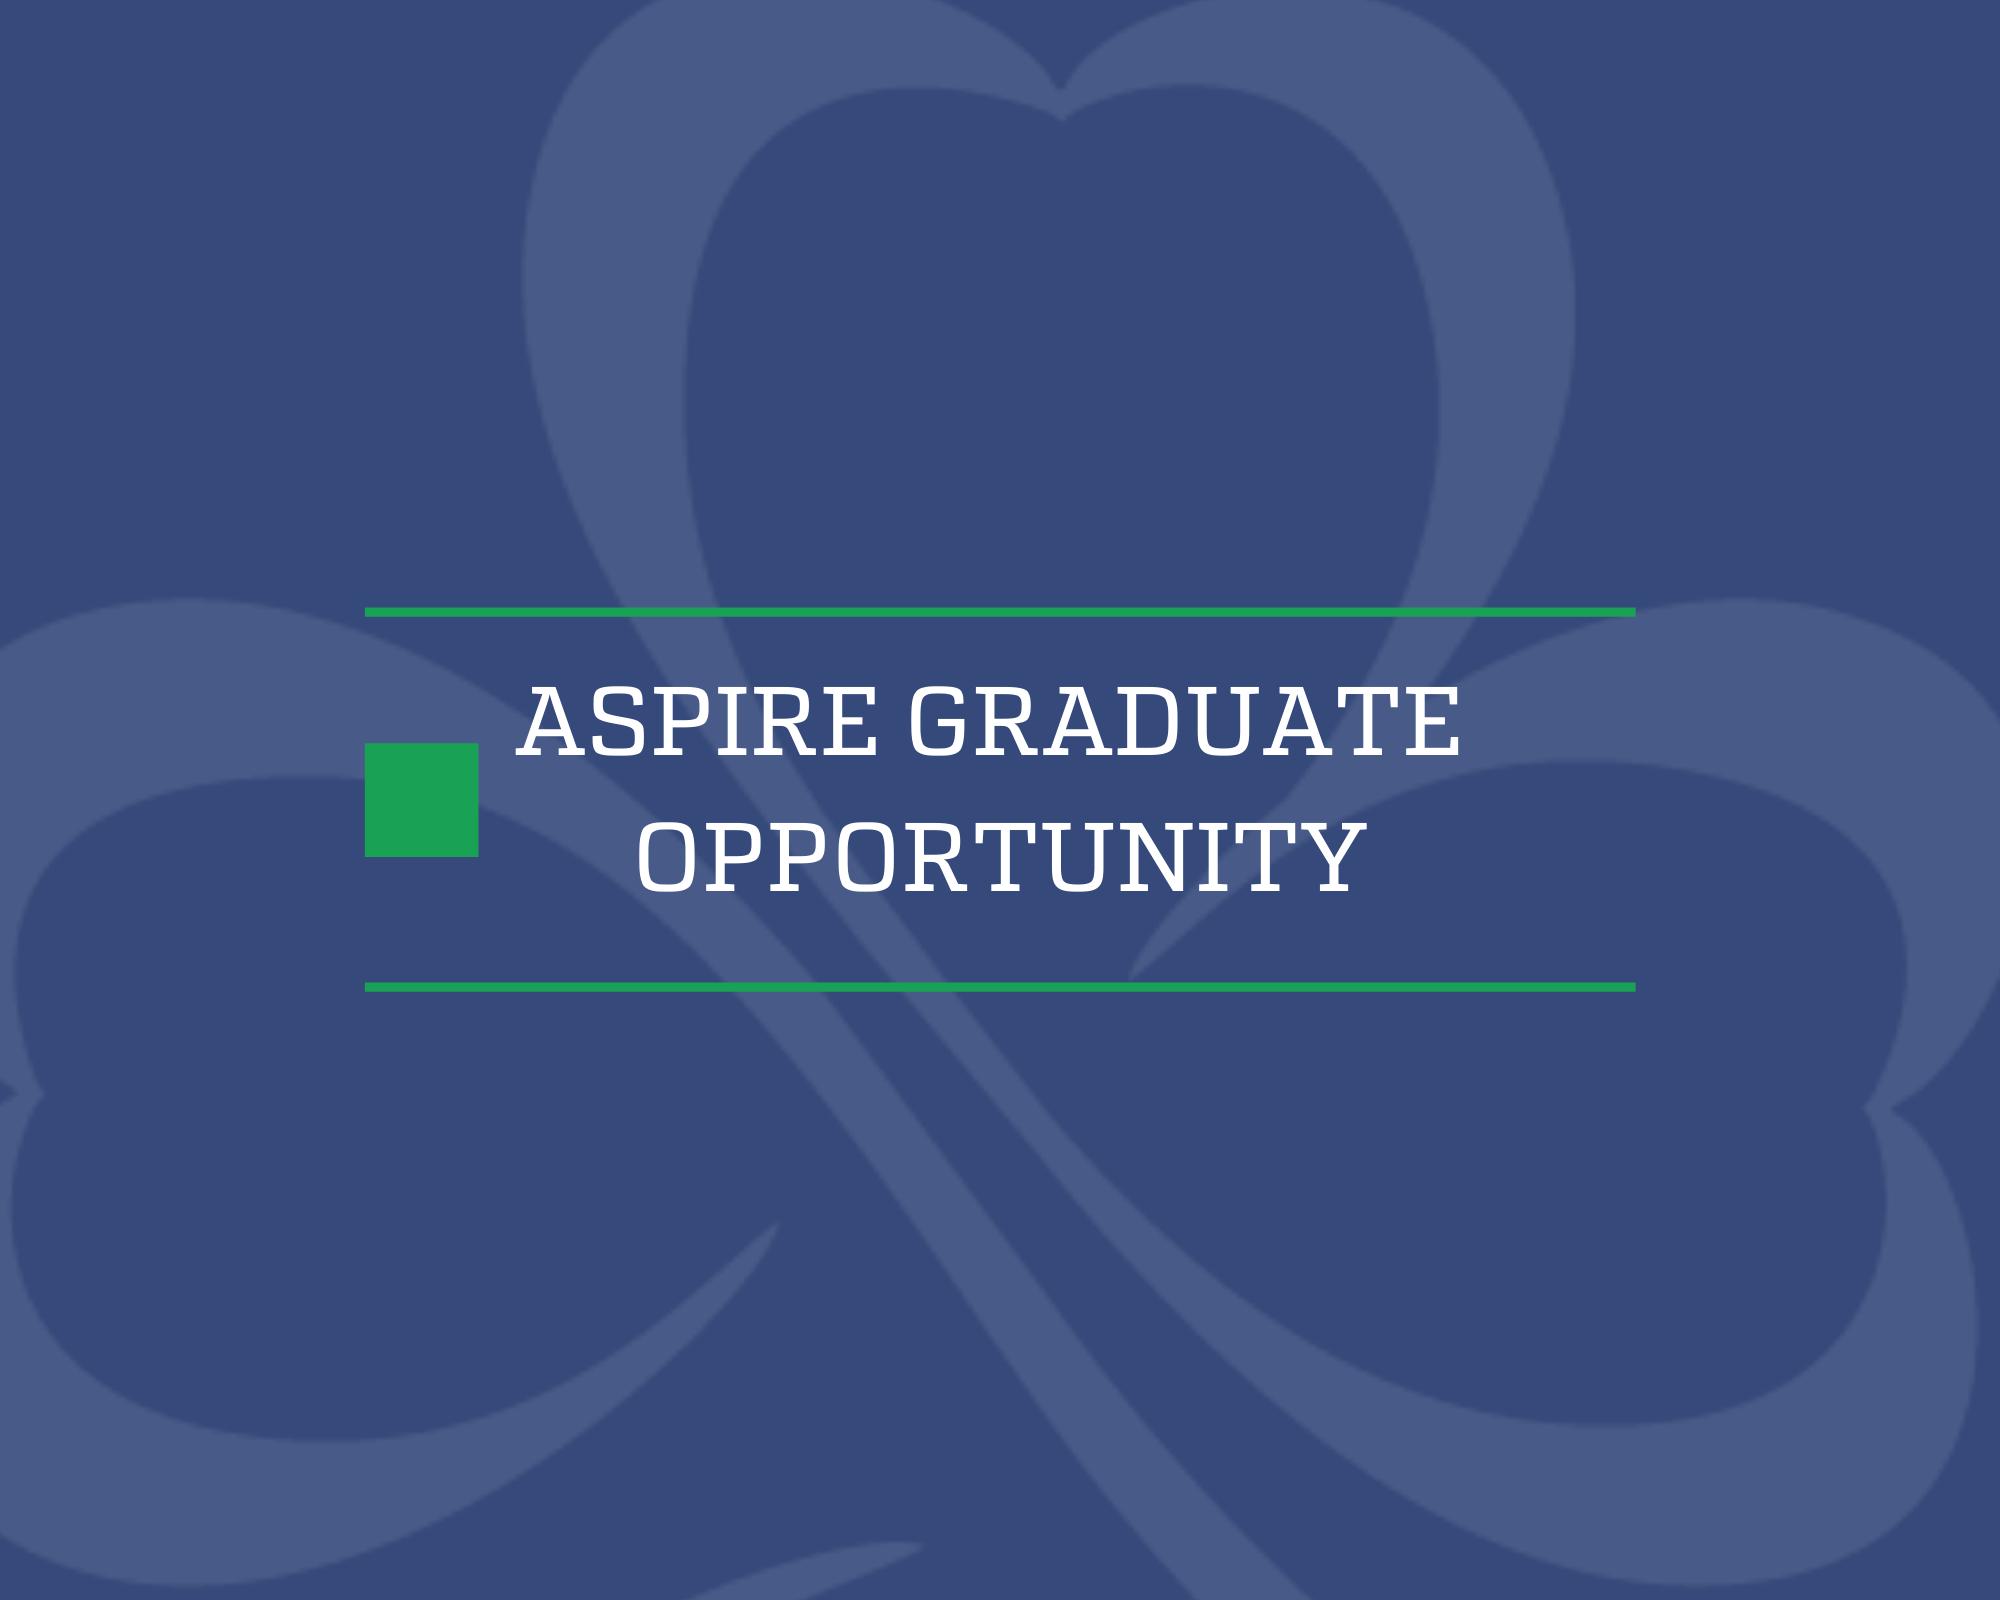 Website ASPIRE GRADUATE OPPORTUNITY